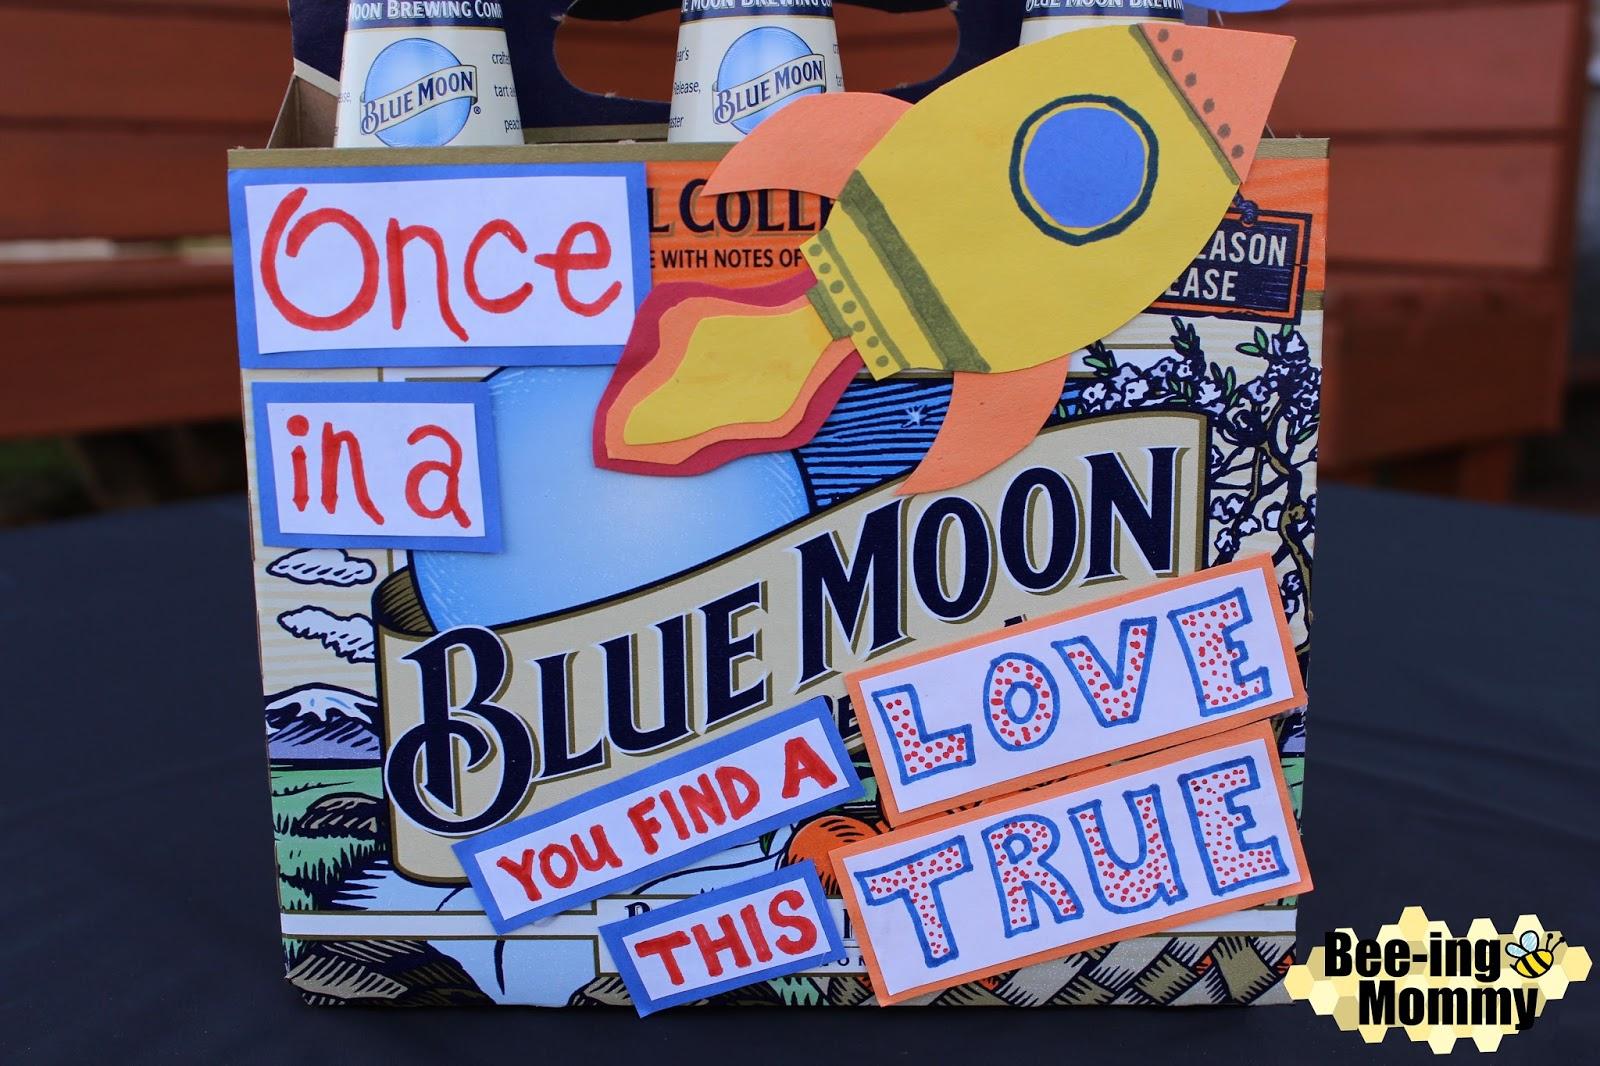 Christmas Ornament//Bulb Blue Moon Brewing Company NEW